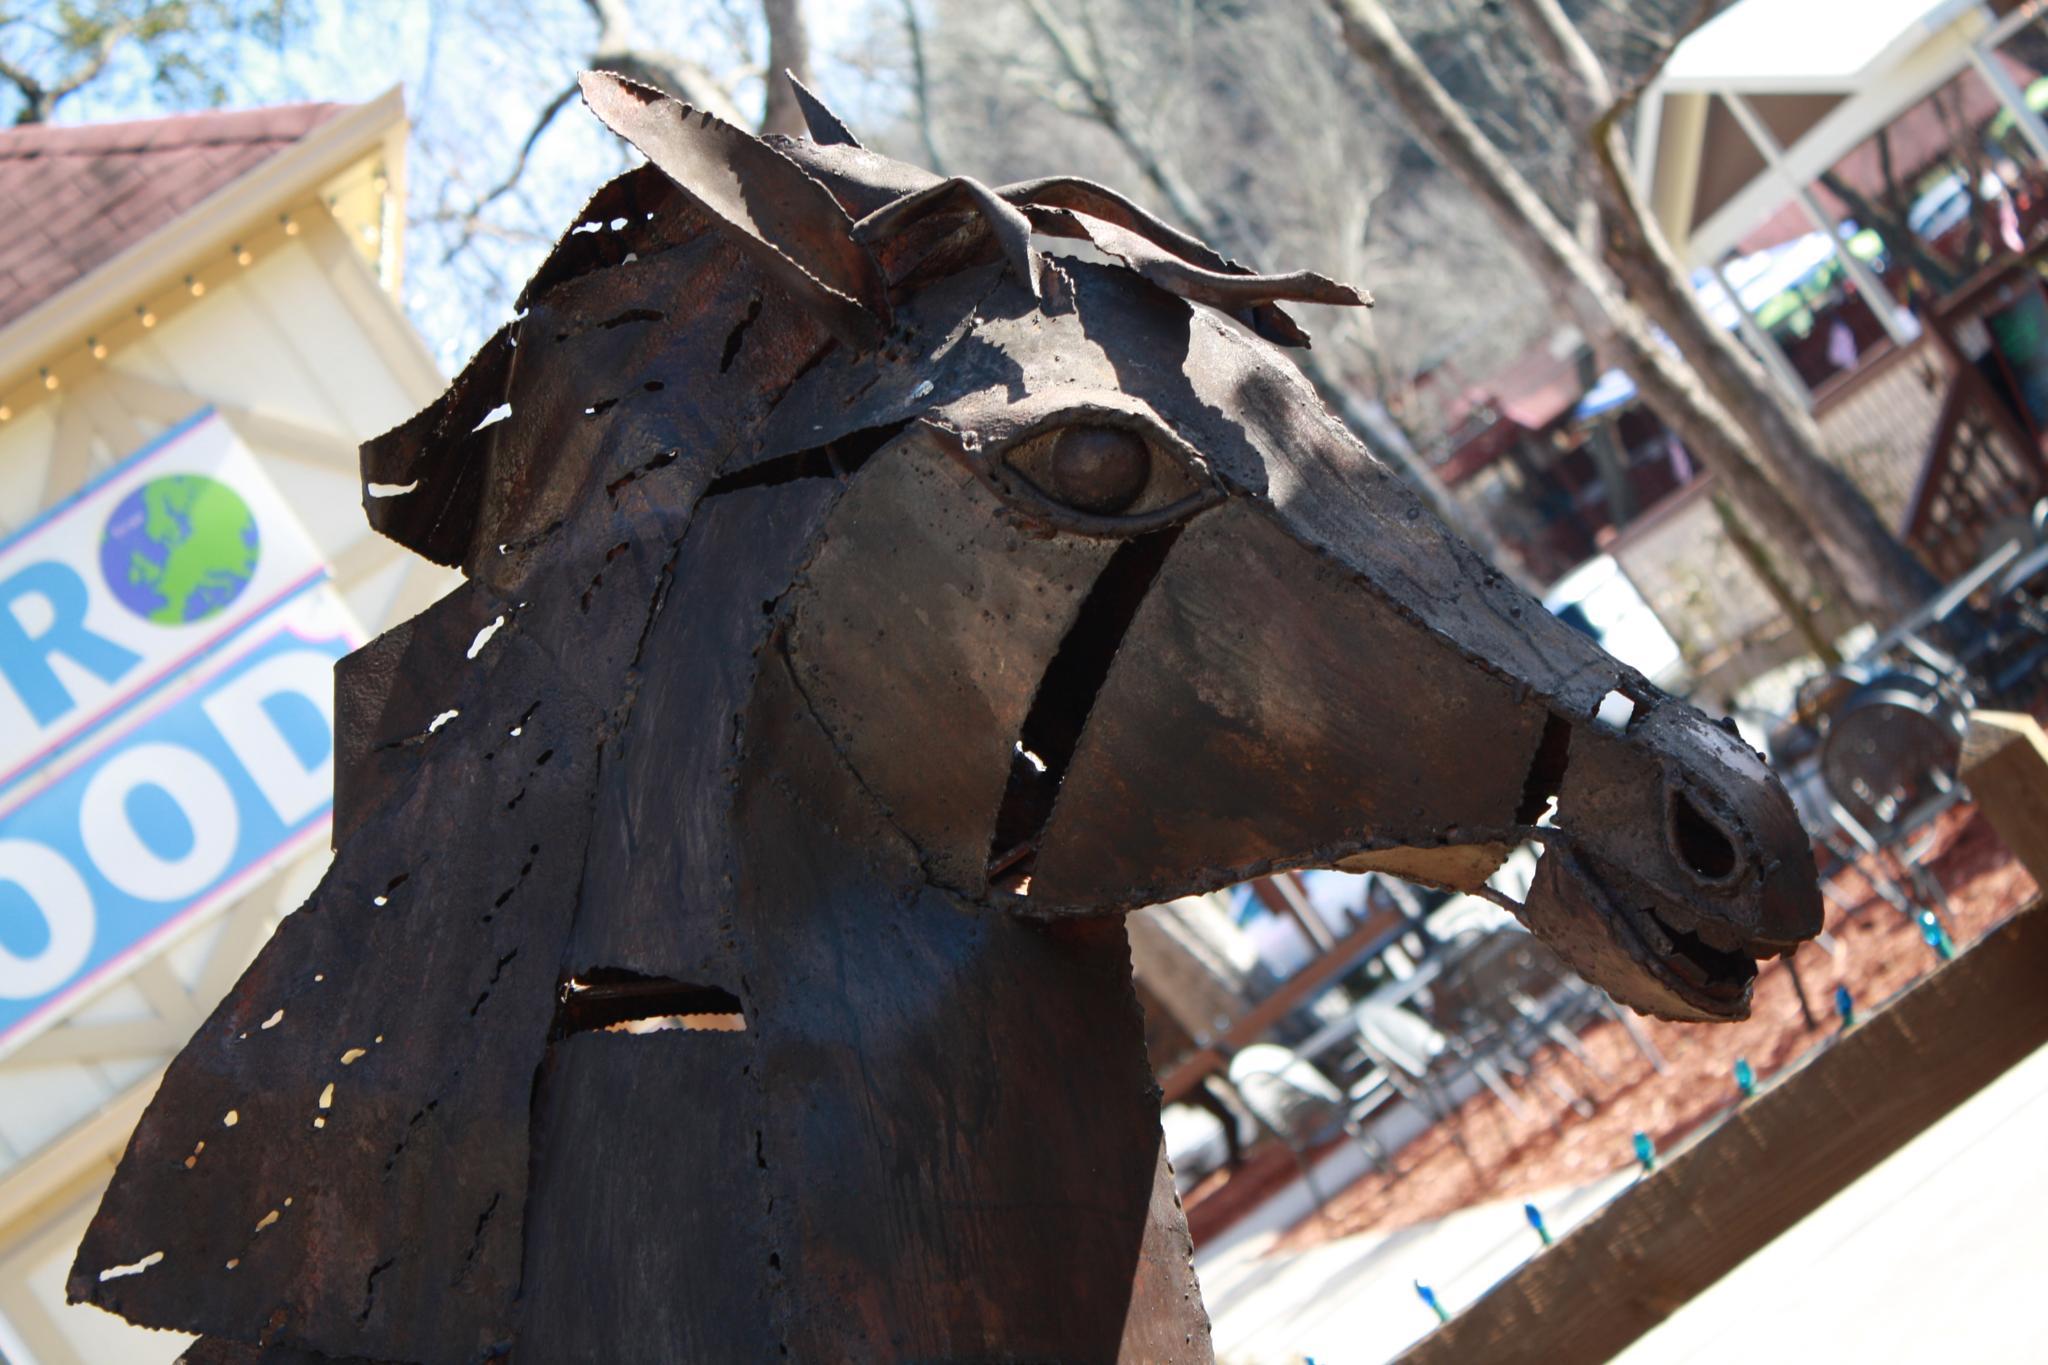 Iron Horse by Nancy L. King